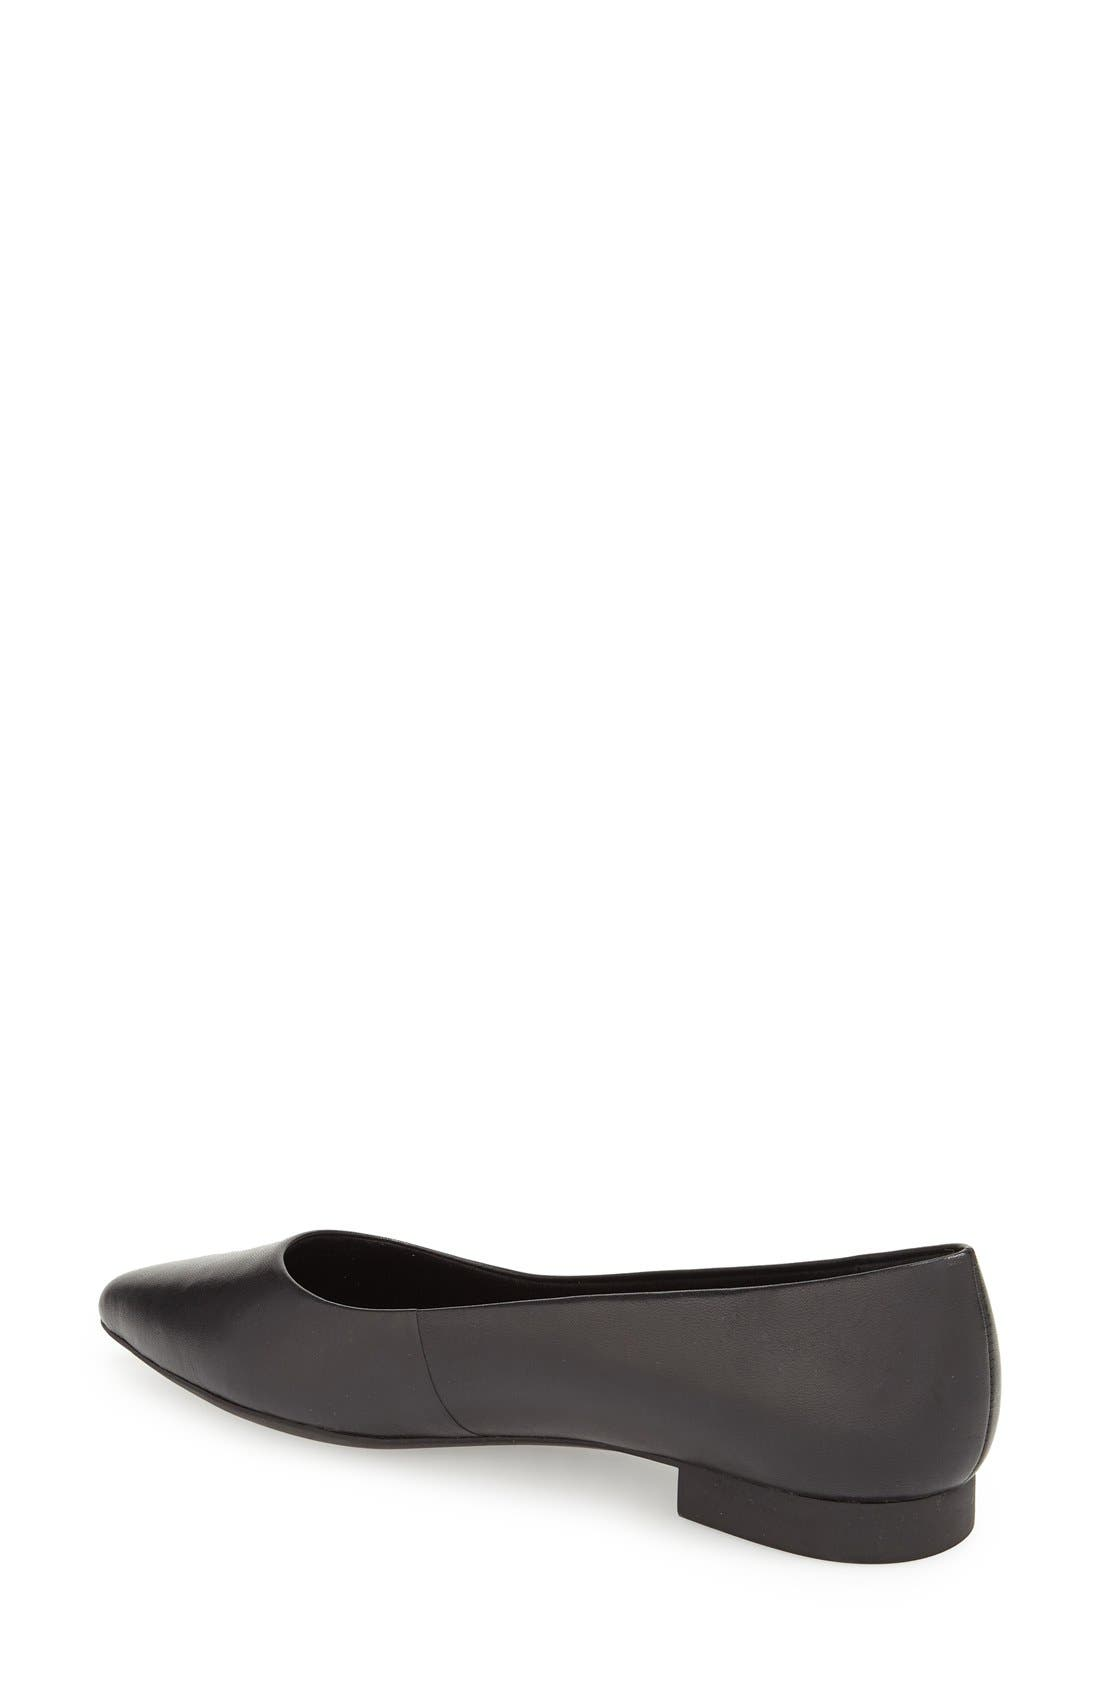 'Vivien' Pointy Toe Flat,                             Alternate thumbnail 2, color,                             Black Leather